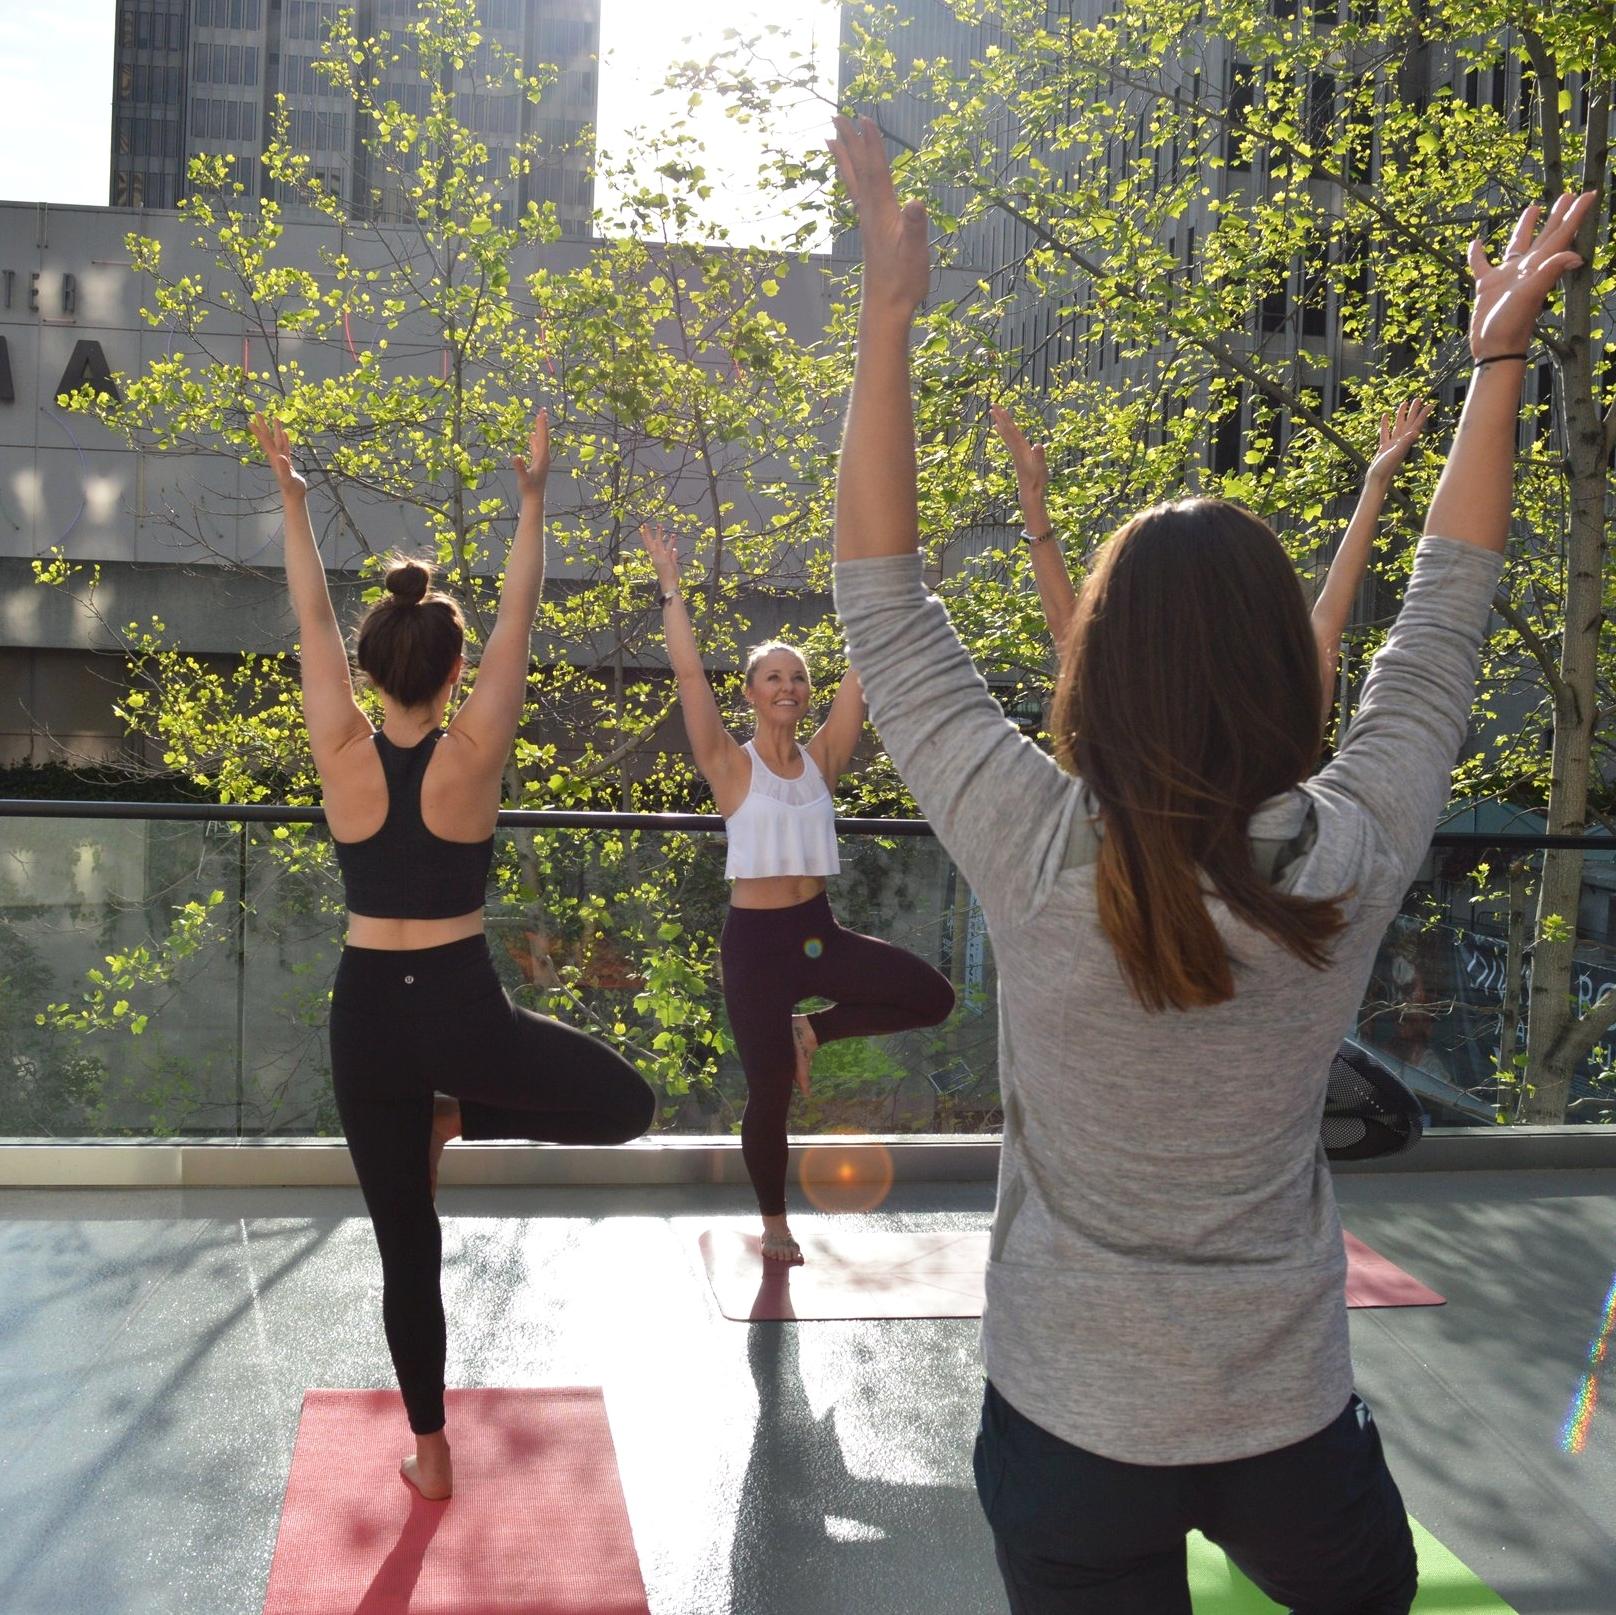 Morning Rooftop Yoga | Le Meridien Hotel, San Francisco